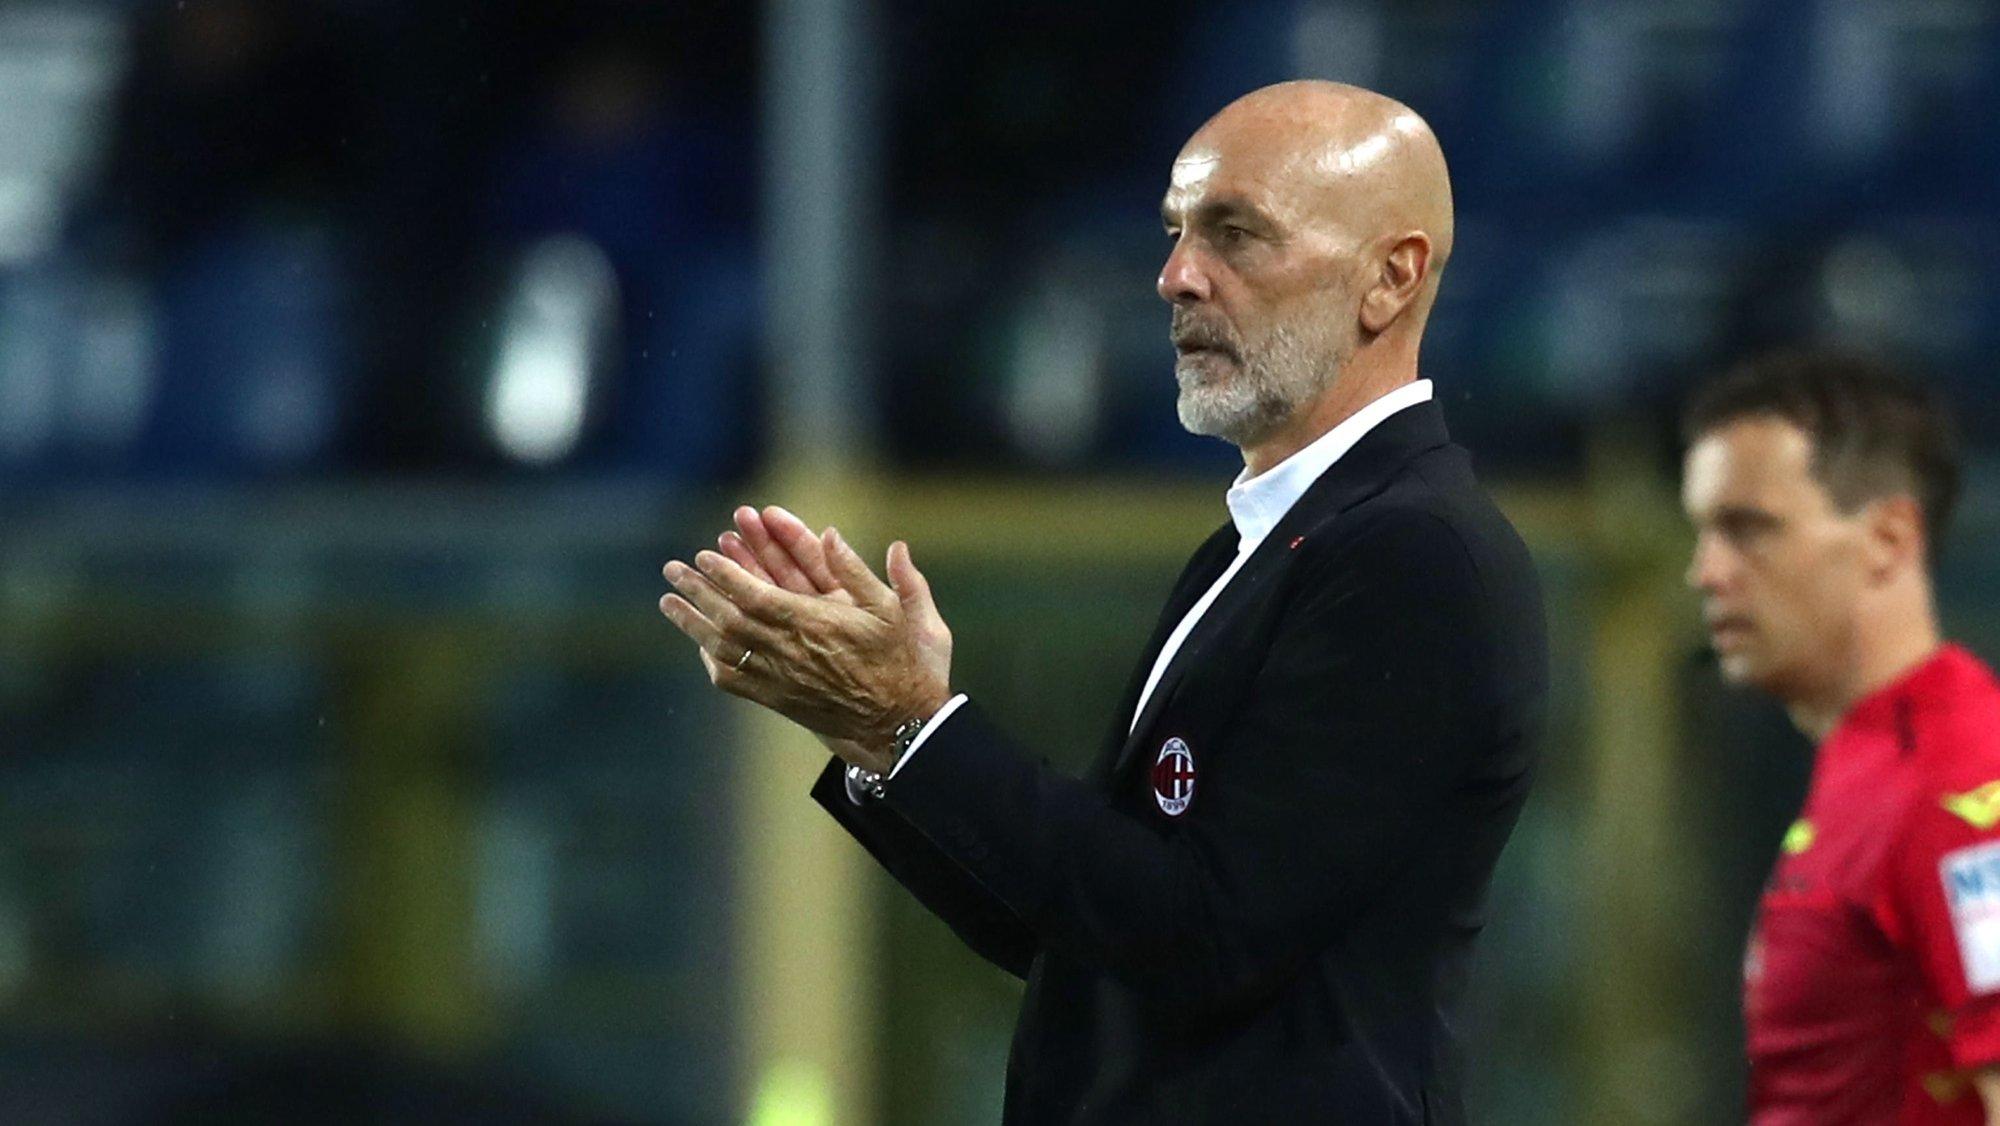 epa09504519 Milan's coach Stefano Pioli applauds during the Italian Serie A soccer match between Atalanta BC and AC Milan at Gewiss Stadium in Bergamo, Italy, 03 October 2021.  EPA/PAOLO MAGNI